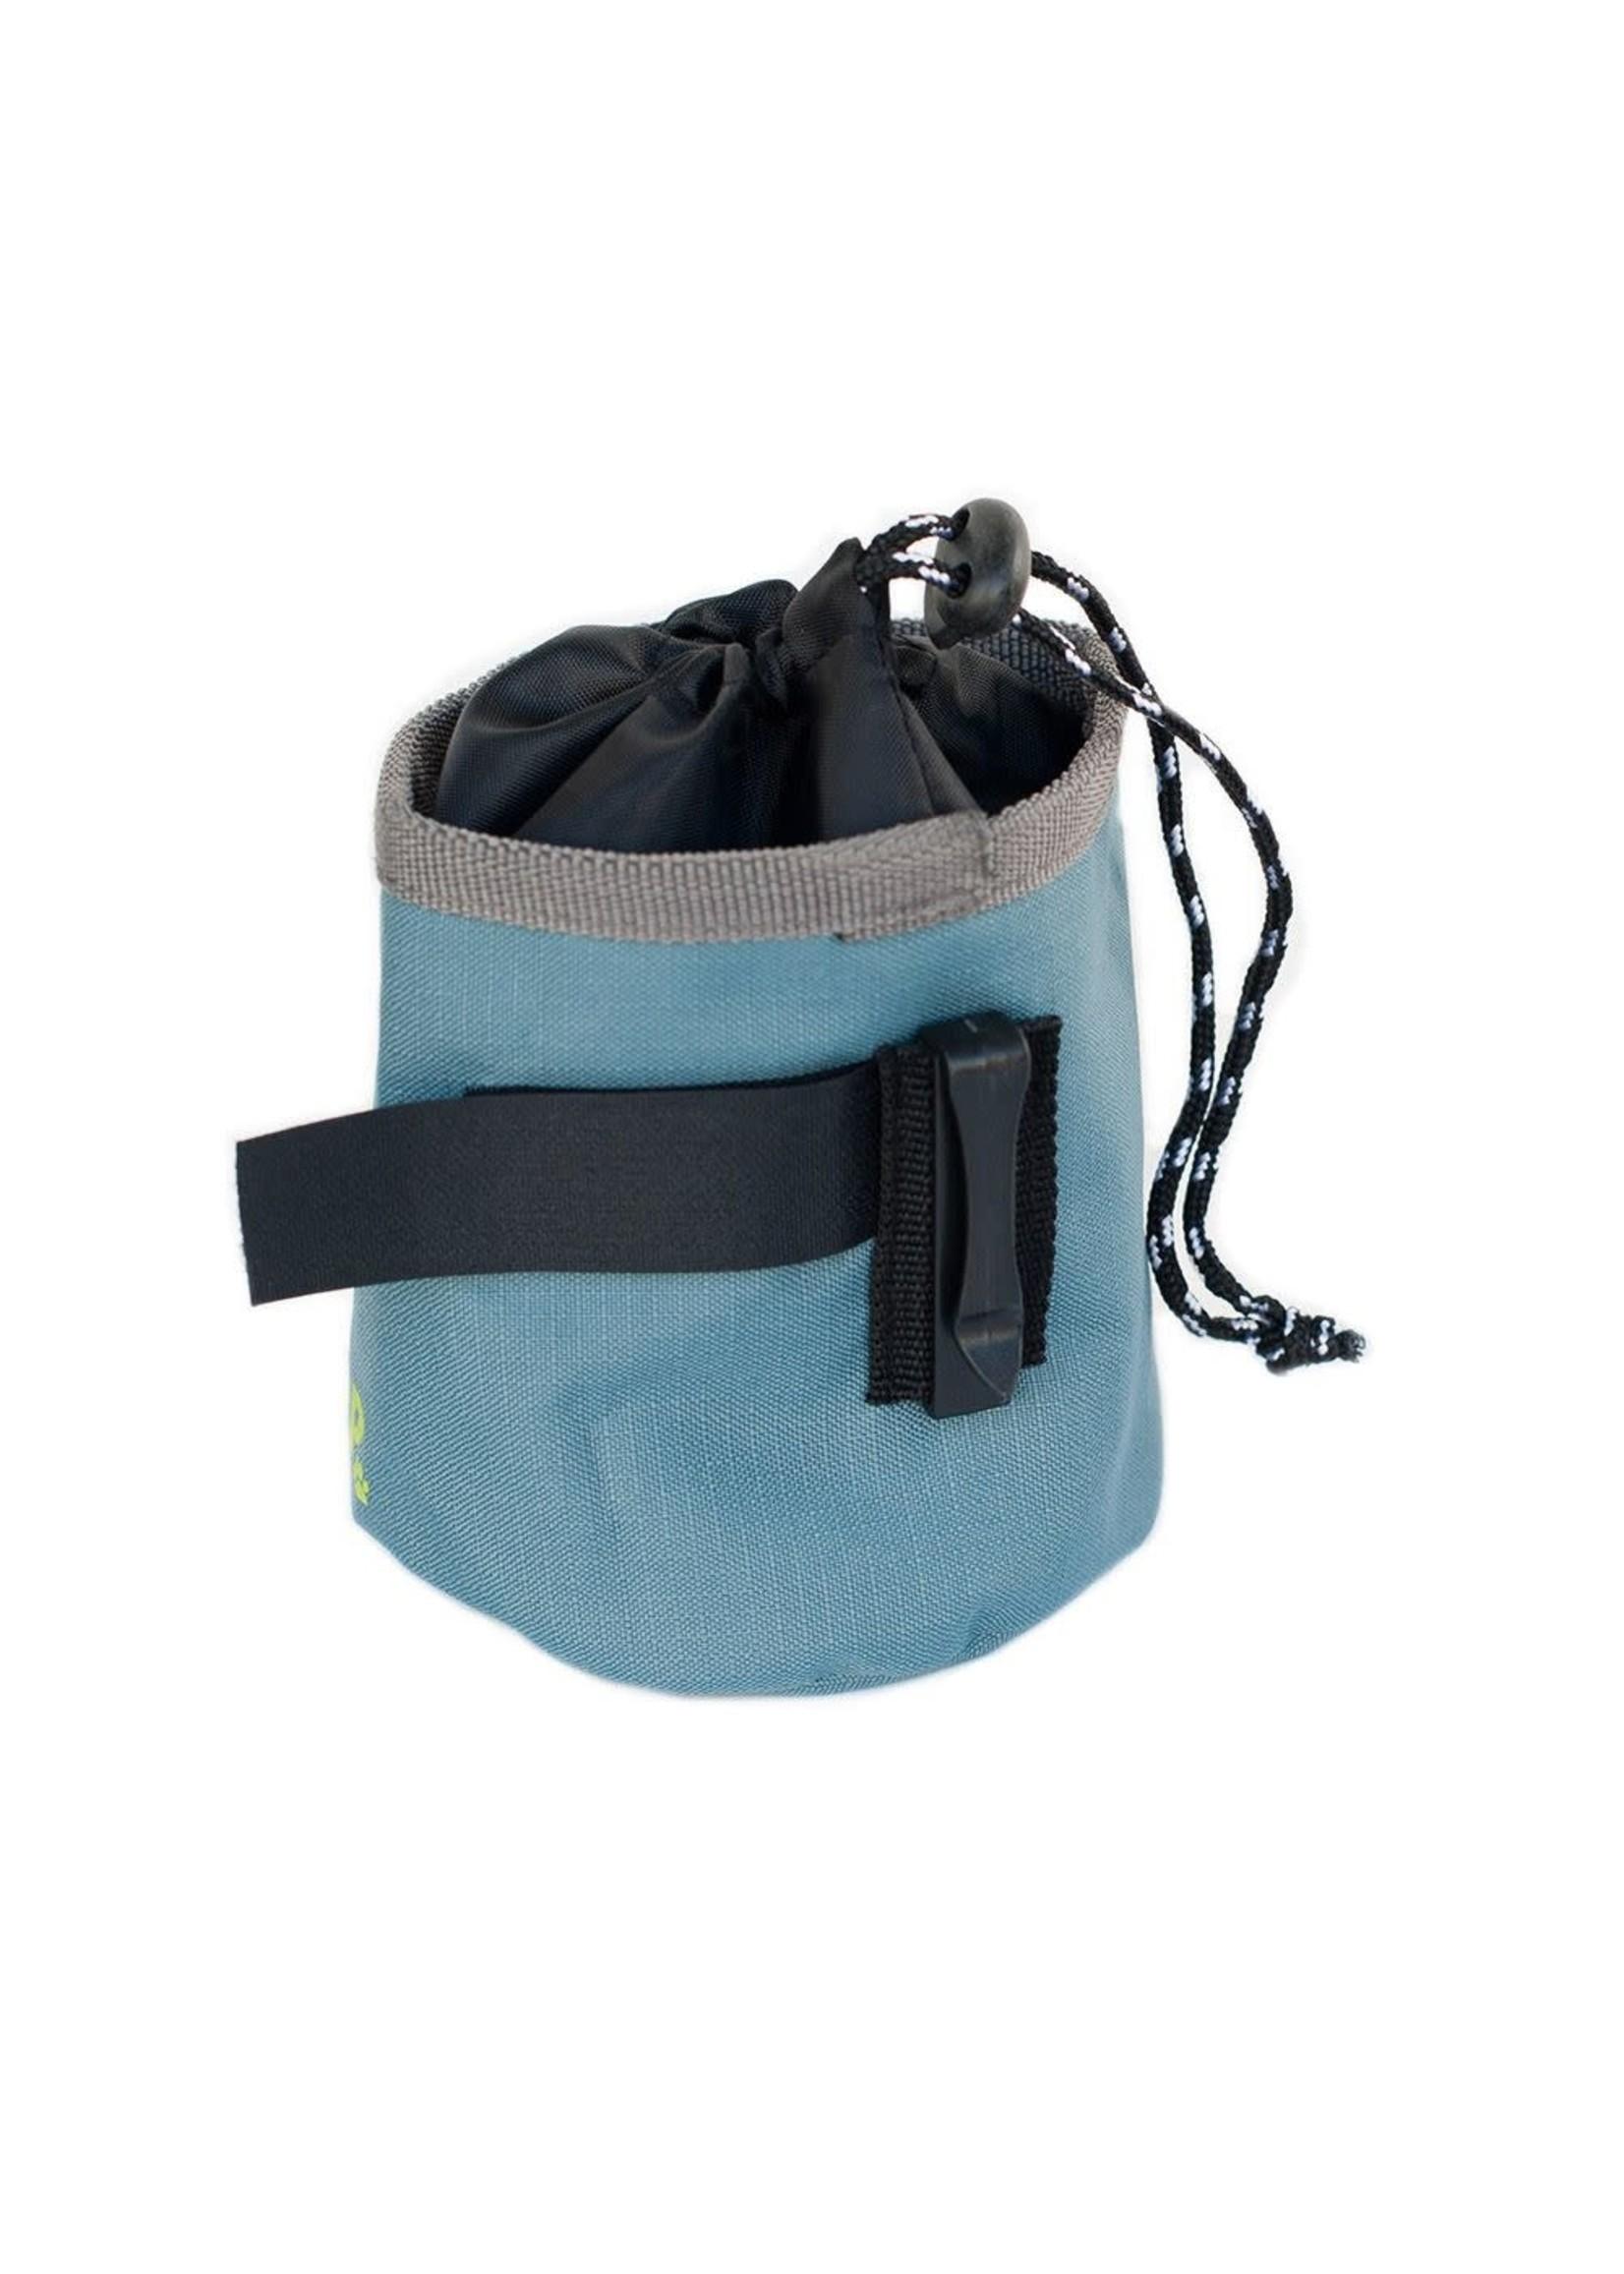 Zippy Adventure Treat Bag Green